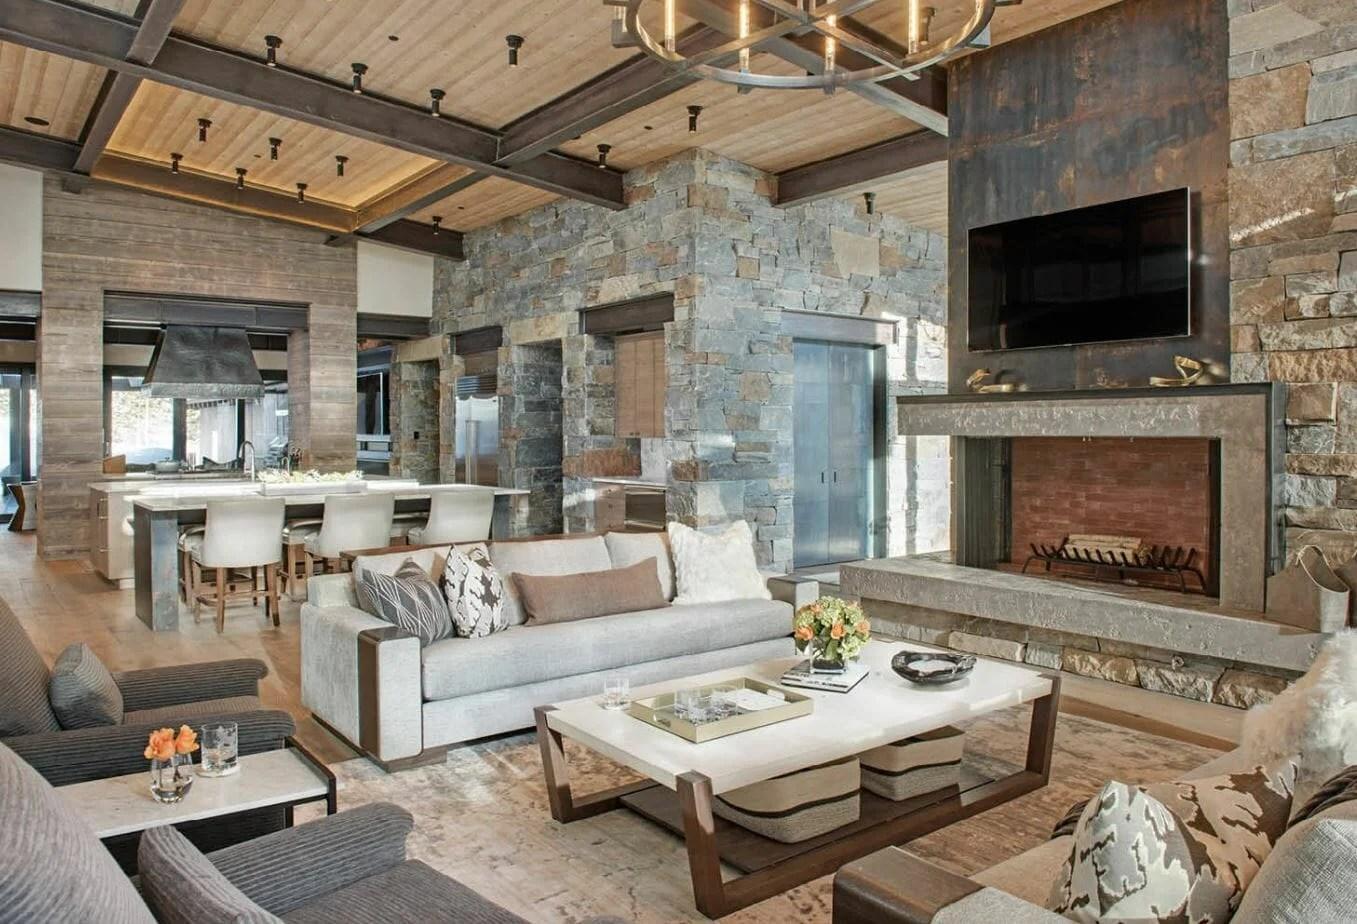 Contemporary Rustic Interior Design Ideas   Home Design Ideas